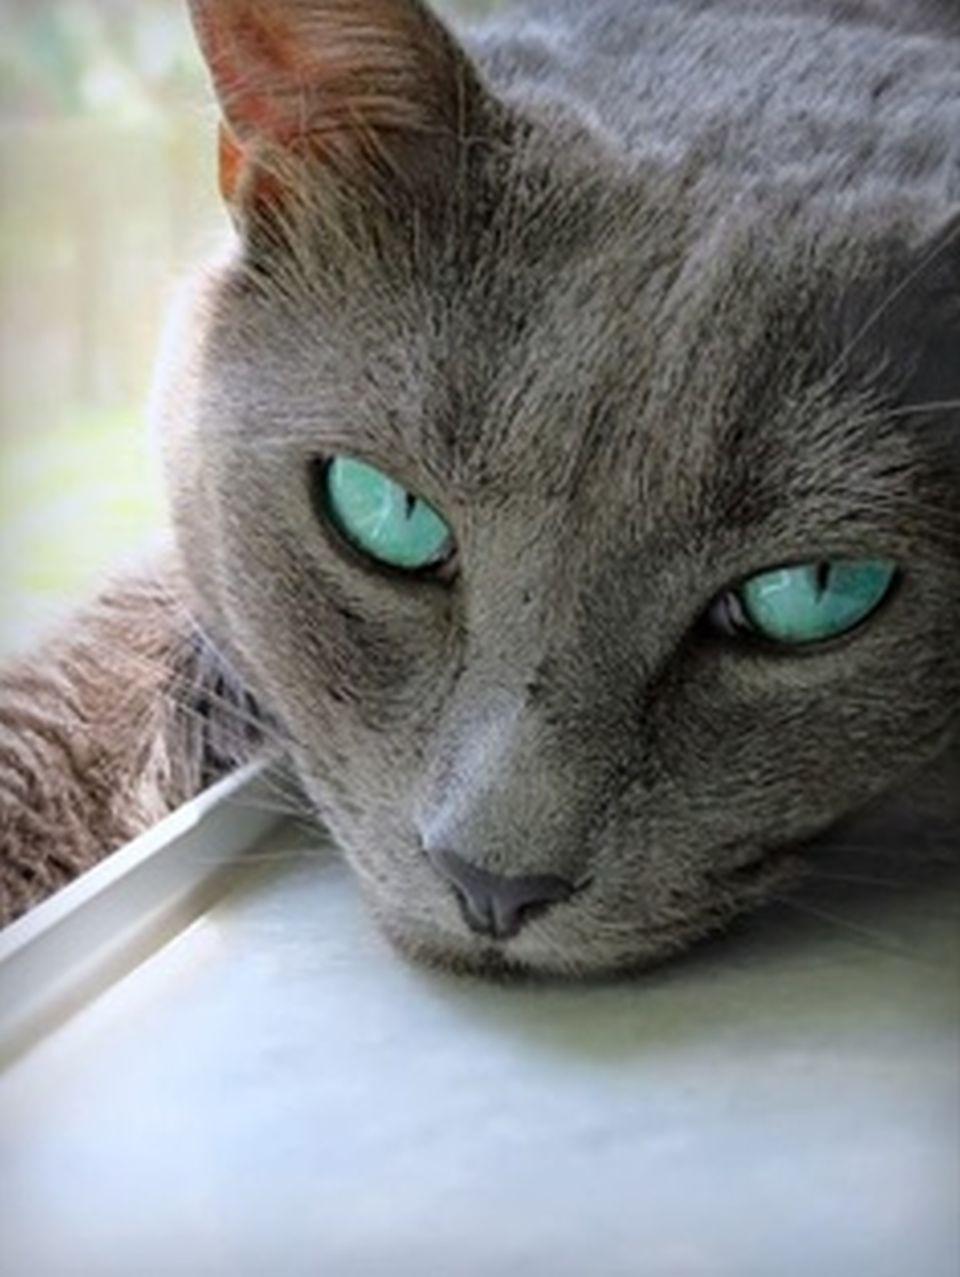 Cat Eye Discharge Cat Eye Discharge Remedy Youtube In 2020 Cat Eye Discharge Cats Cats And Kittens